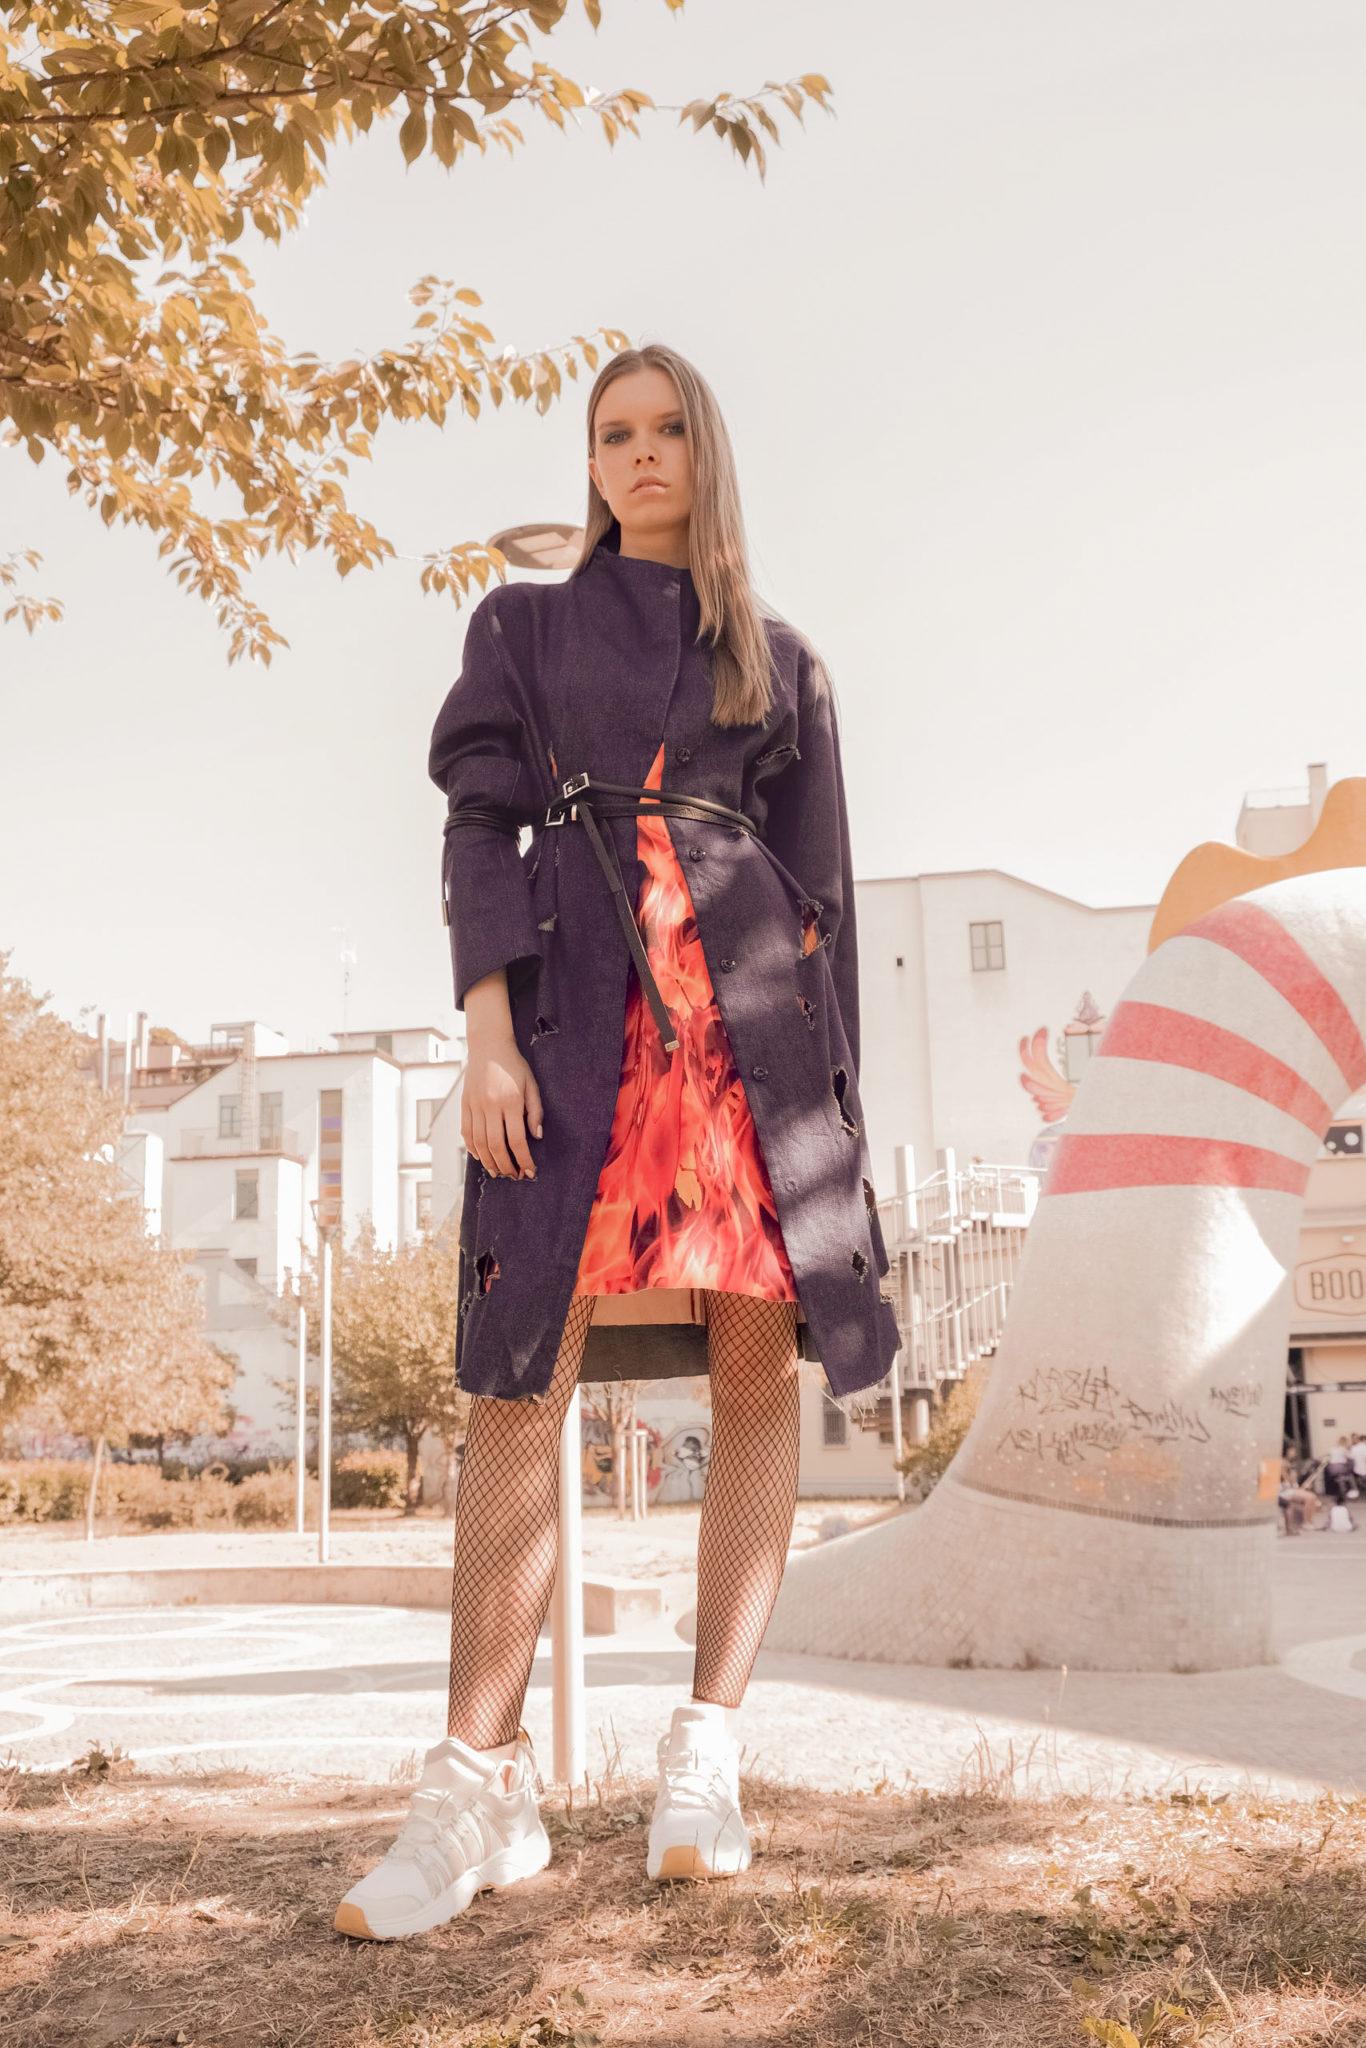 Myriam Tisbo violettes fashion story editorial le dernier etage magazine webzine photography mode webditorial